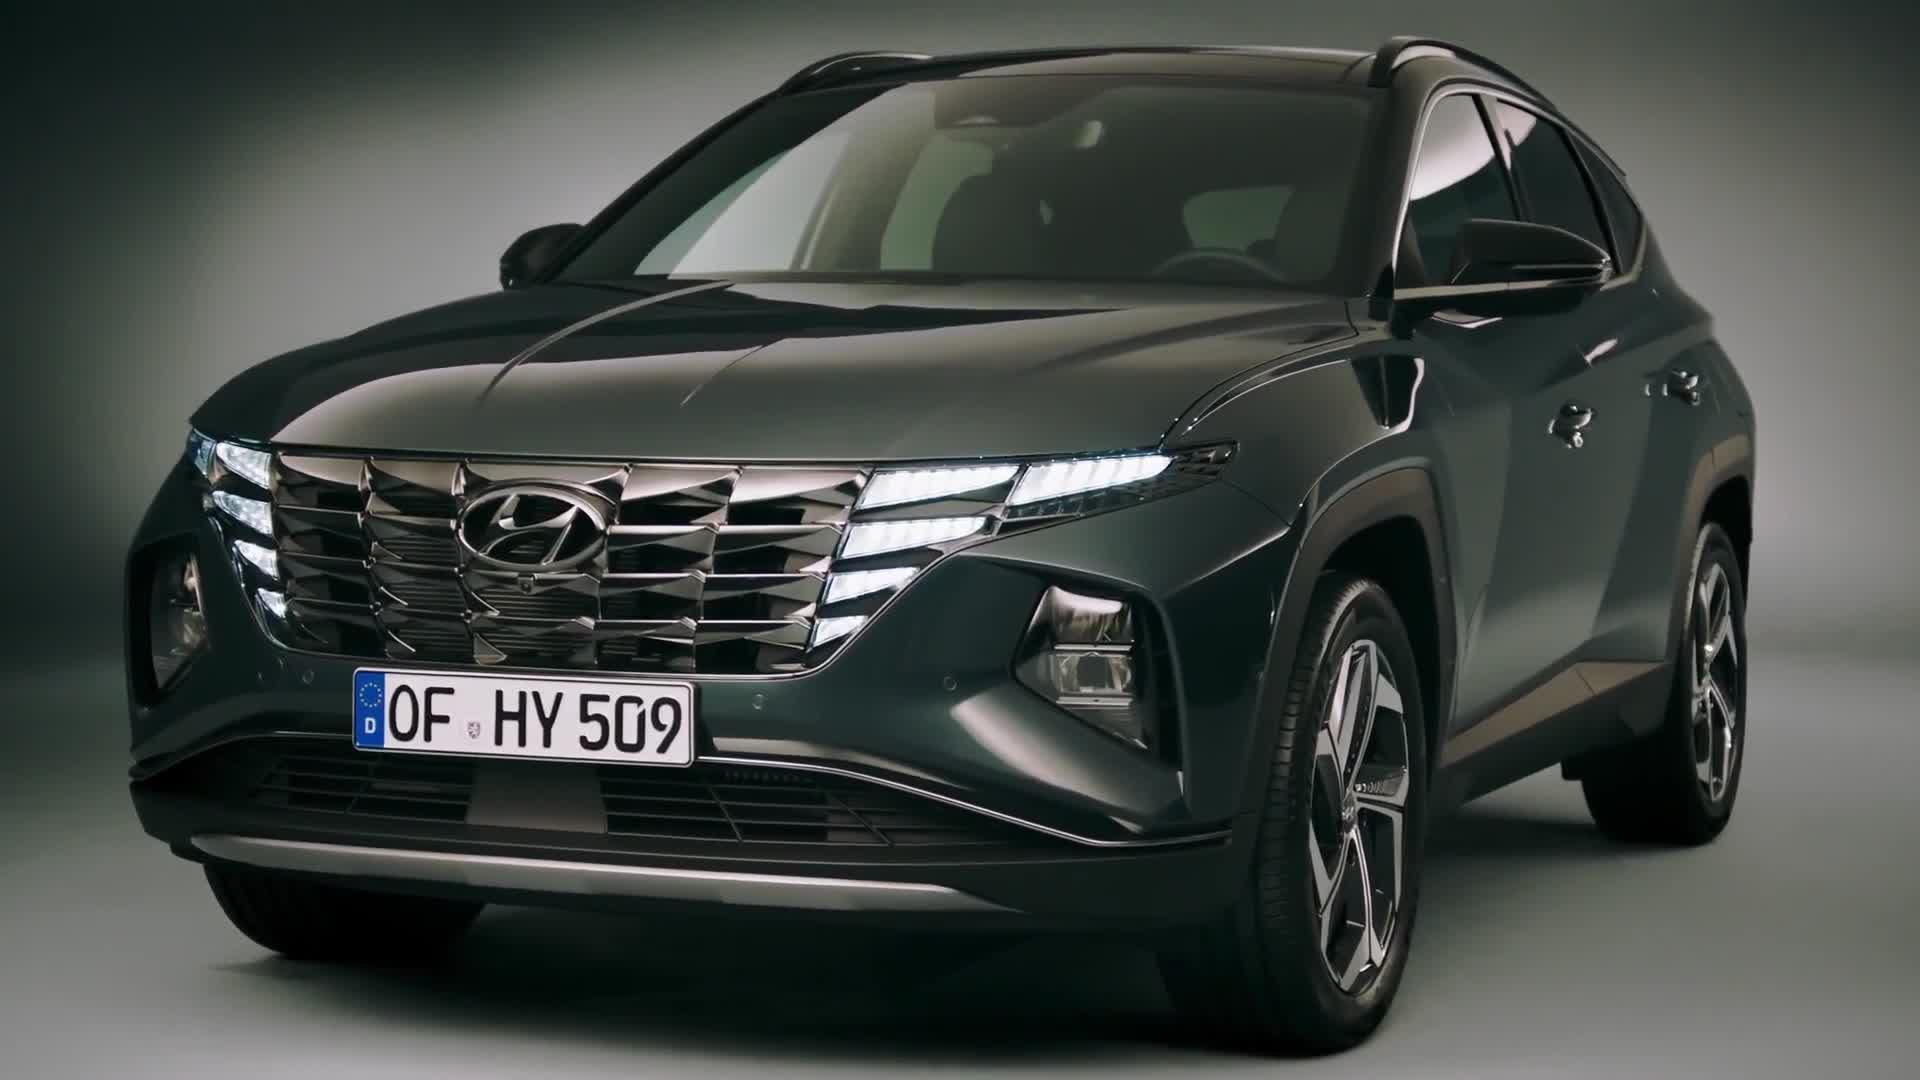 Khám phá nhanh Hyundai Tucson 2021